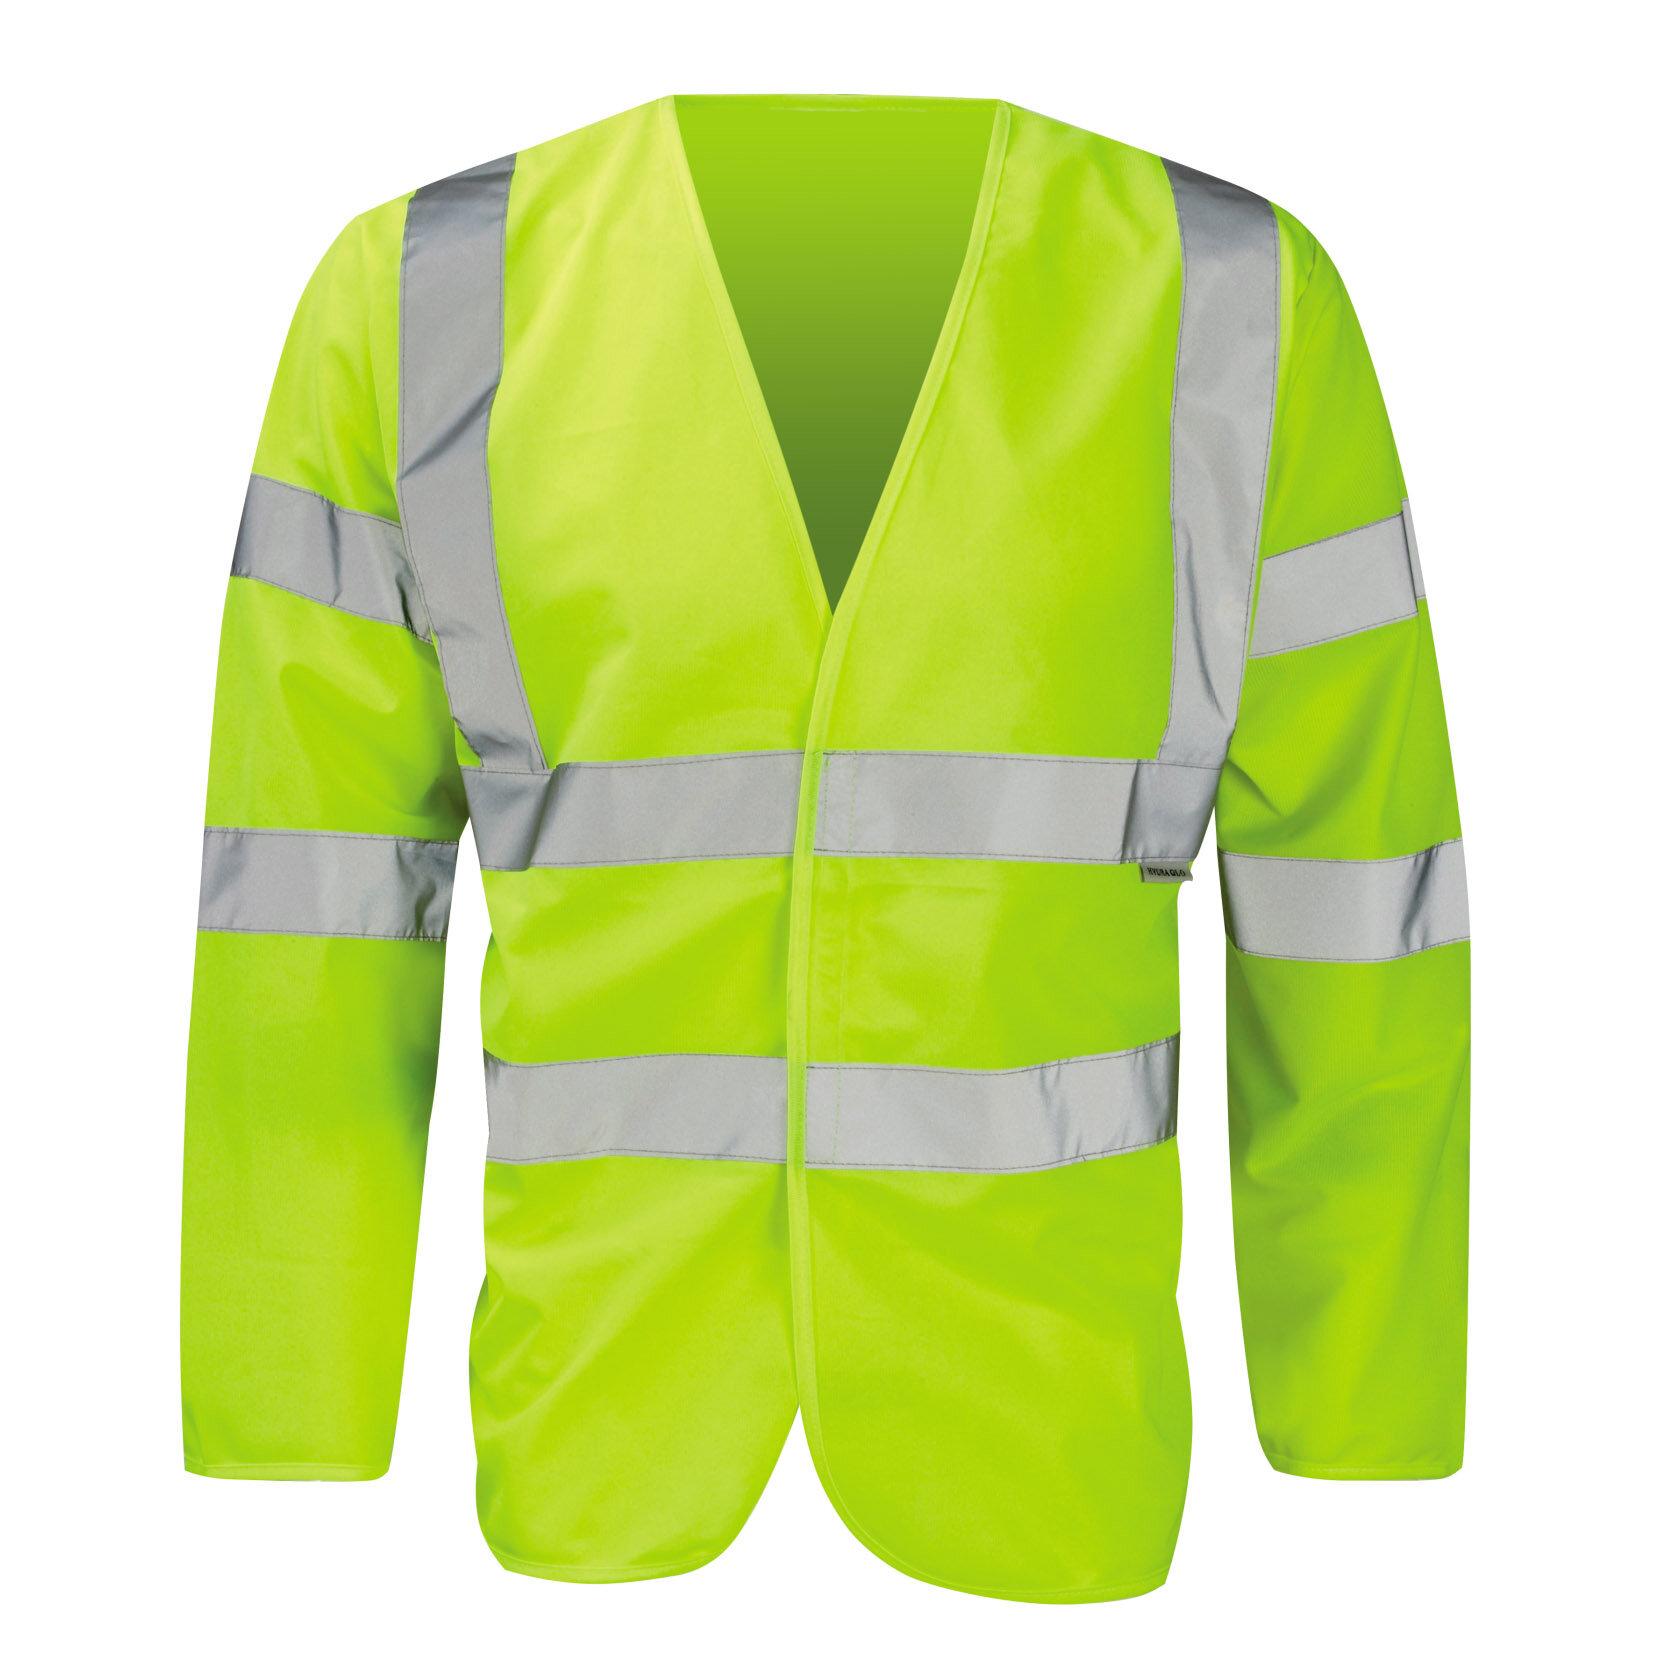 BOA Hi-Vis Long Sleeve Vest Class 3 Yellow or Orange